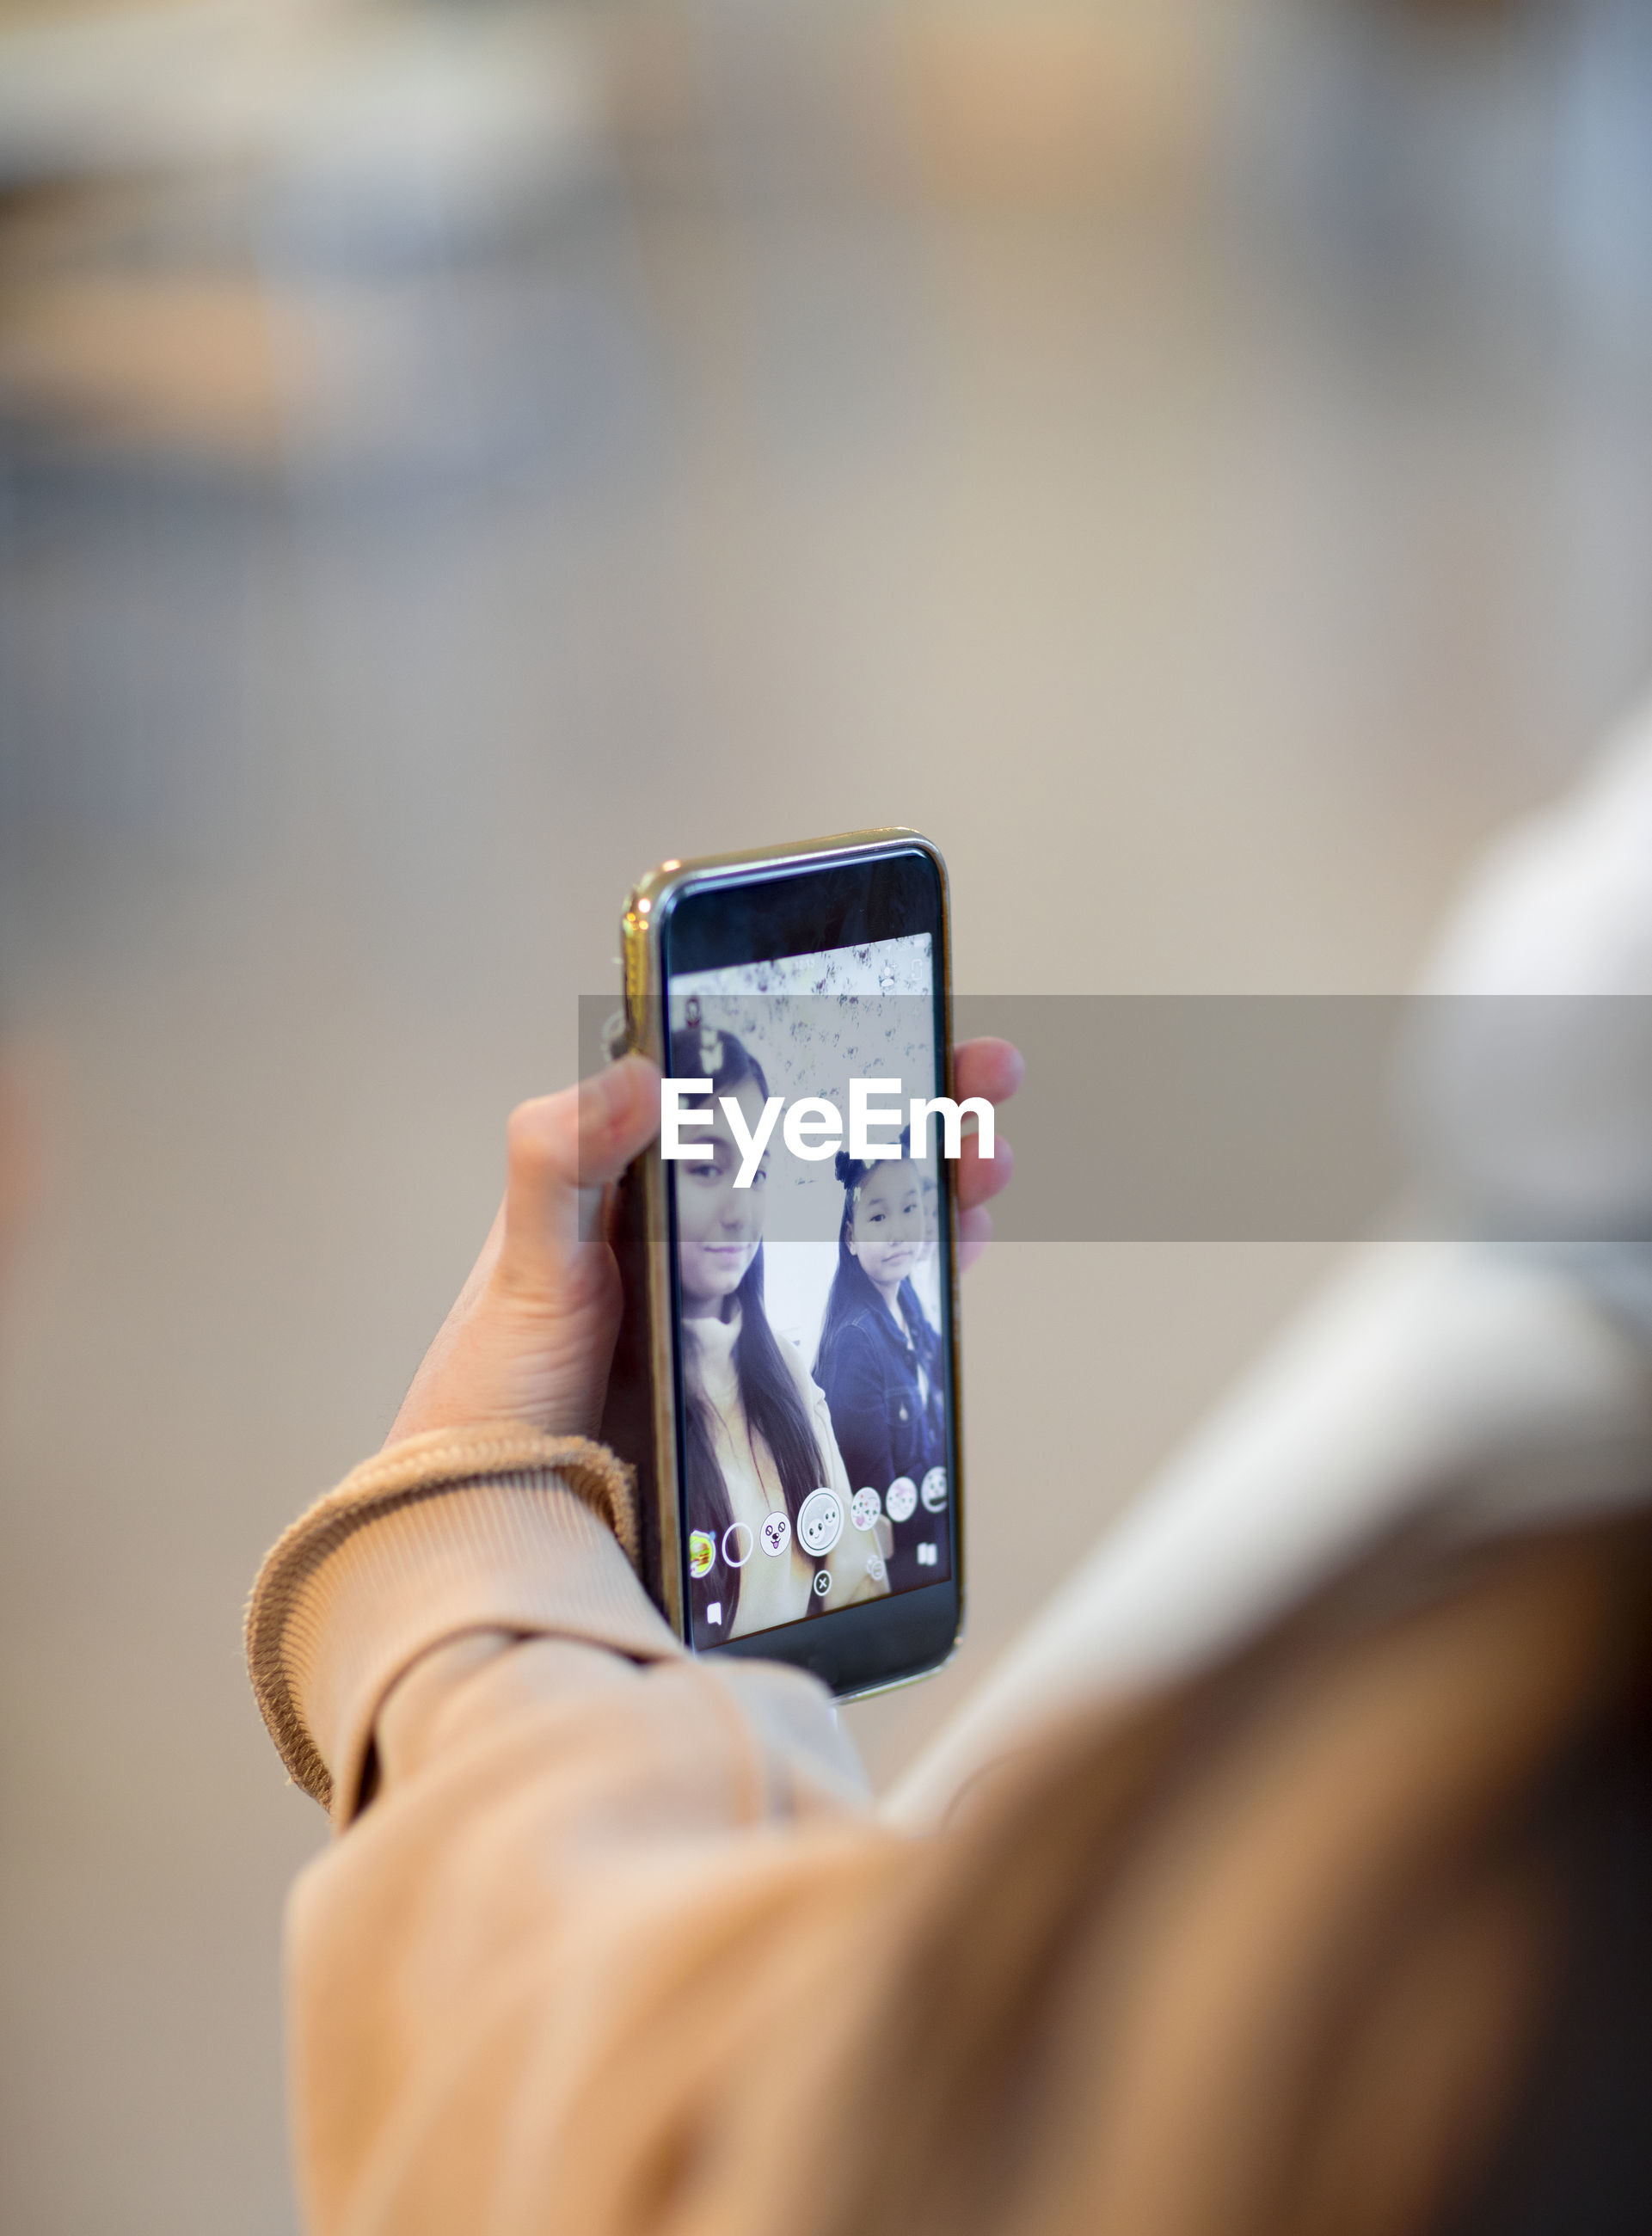 HUMAN HAND HOLDING CAMERA PHONE